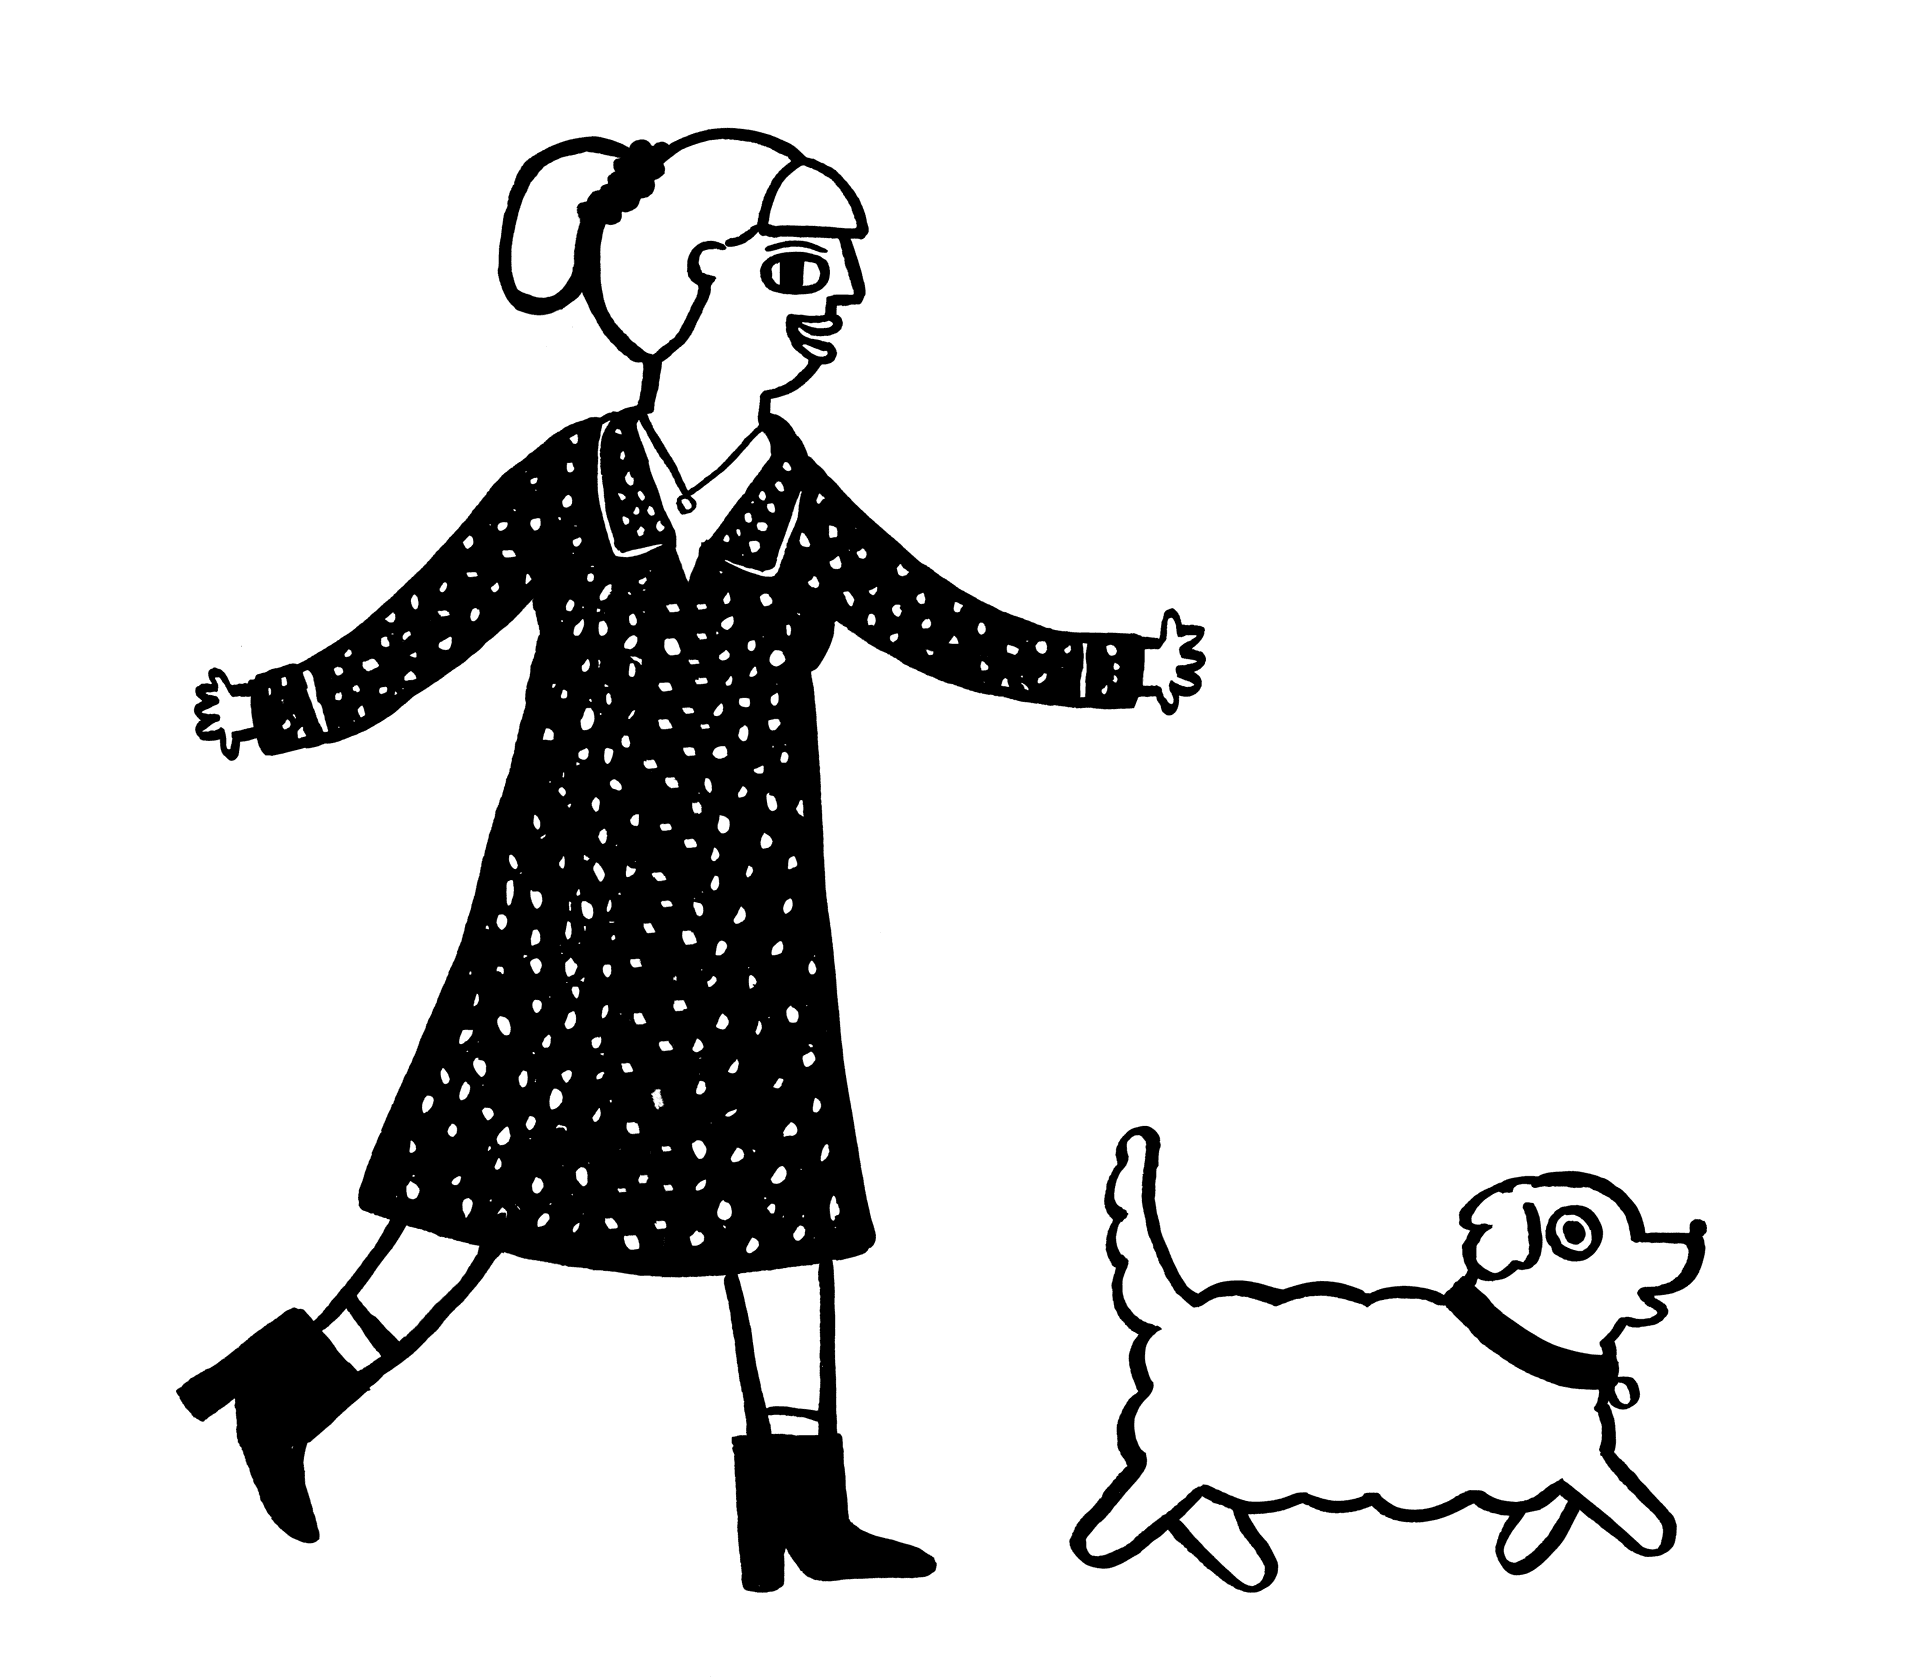 Woman and Dog Illustration Brick By Brick